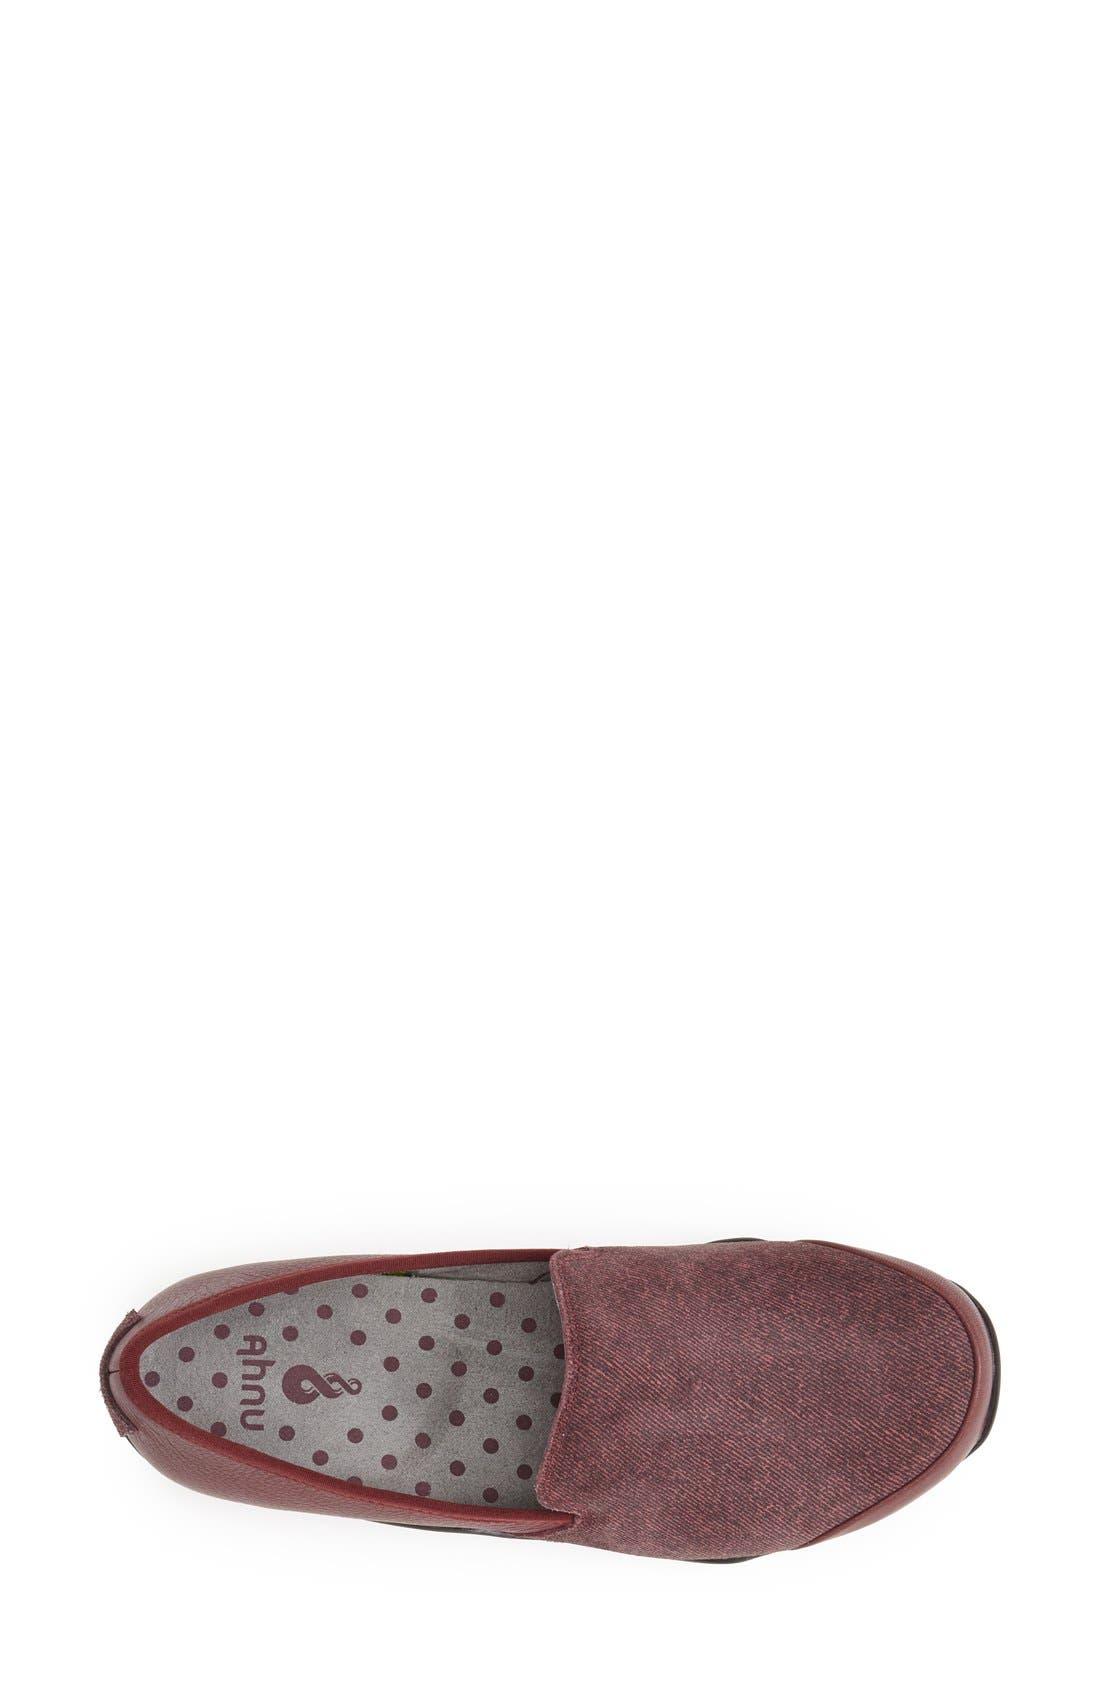 Alternate Image 3  - Ahnu 'Penny' Leather Loafer (Women)